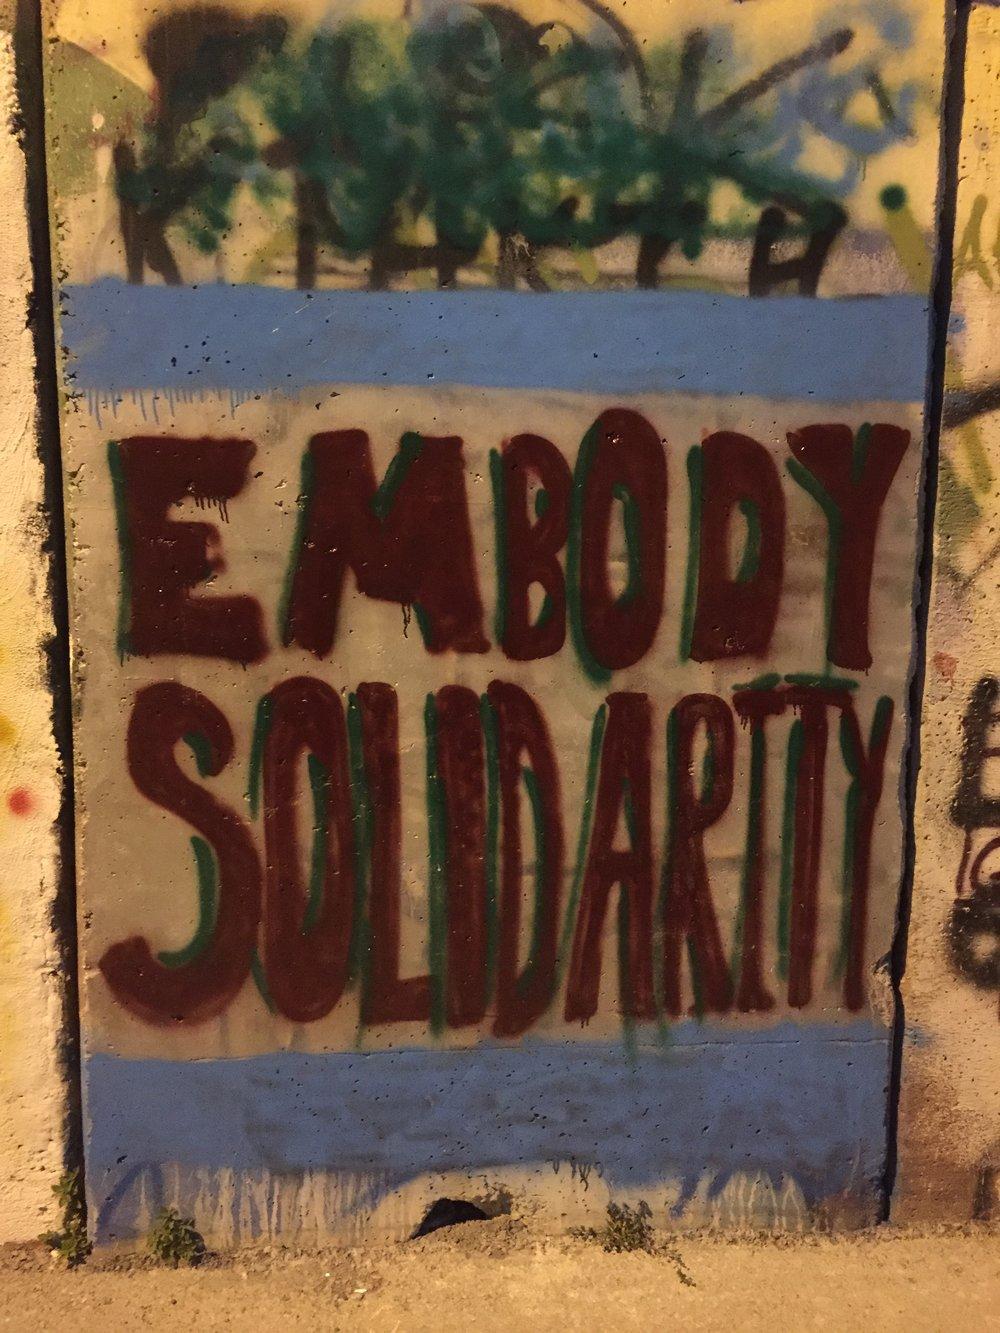 EmbodySolidarityWall.jpg